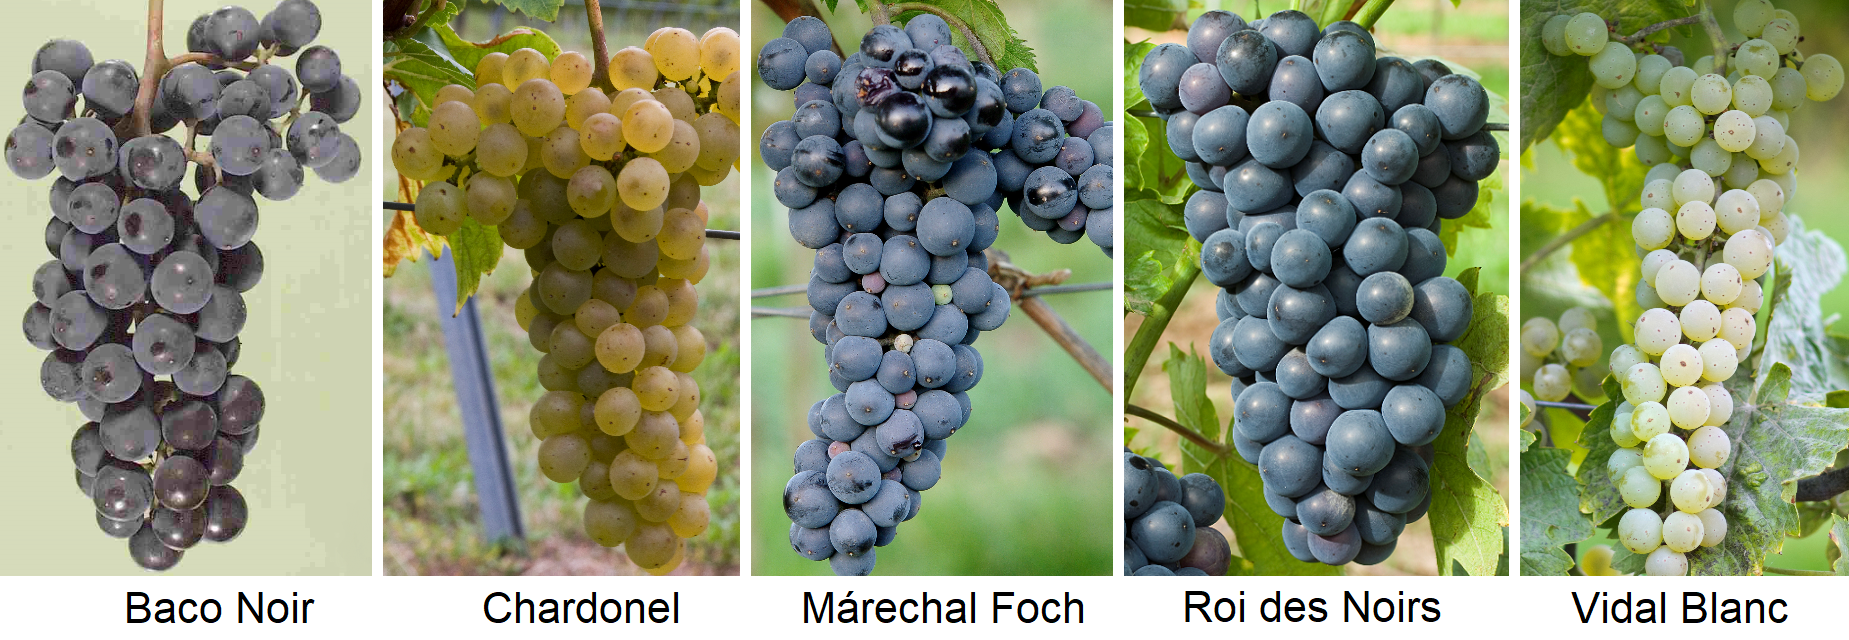 French hybrids - Baco Noir, Chardonel, Márechal Foch, Roi des Noirs, Vidal Blanc